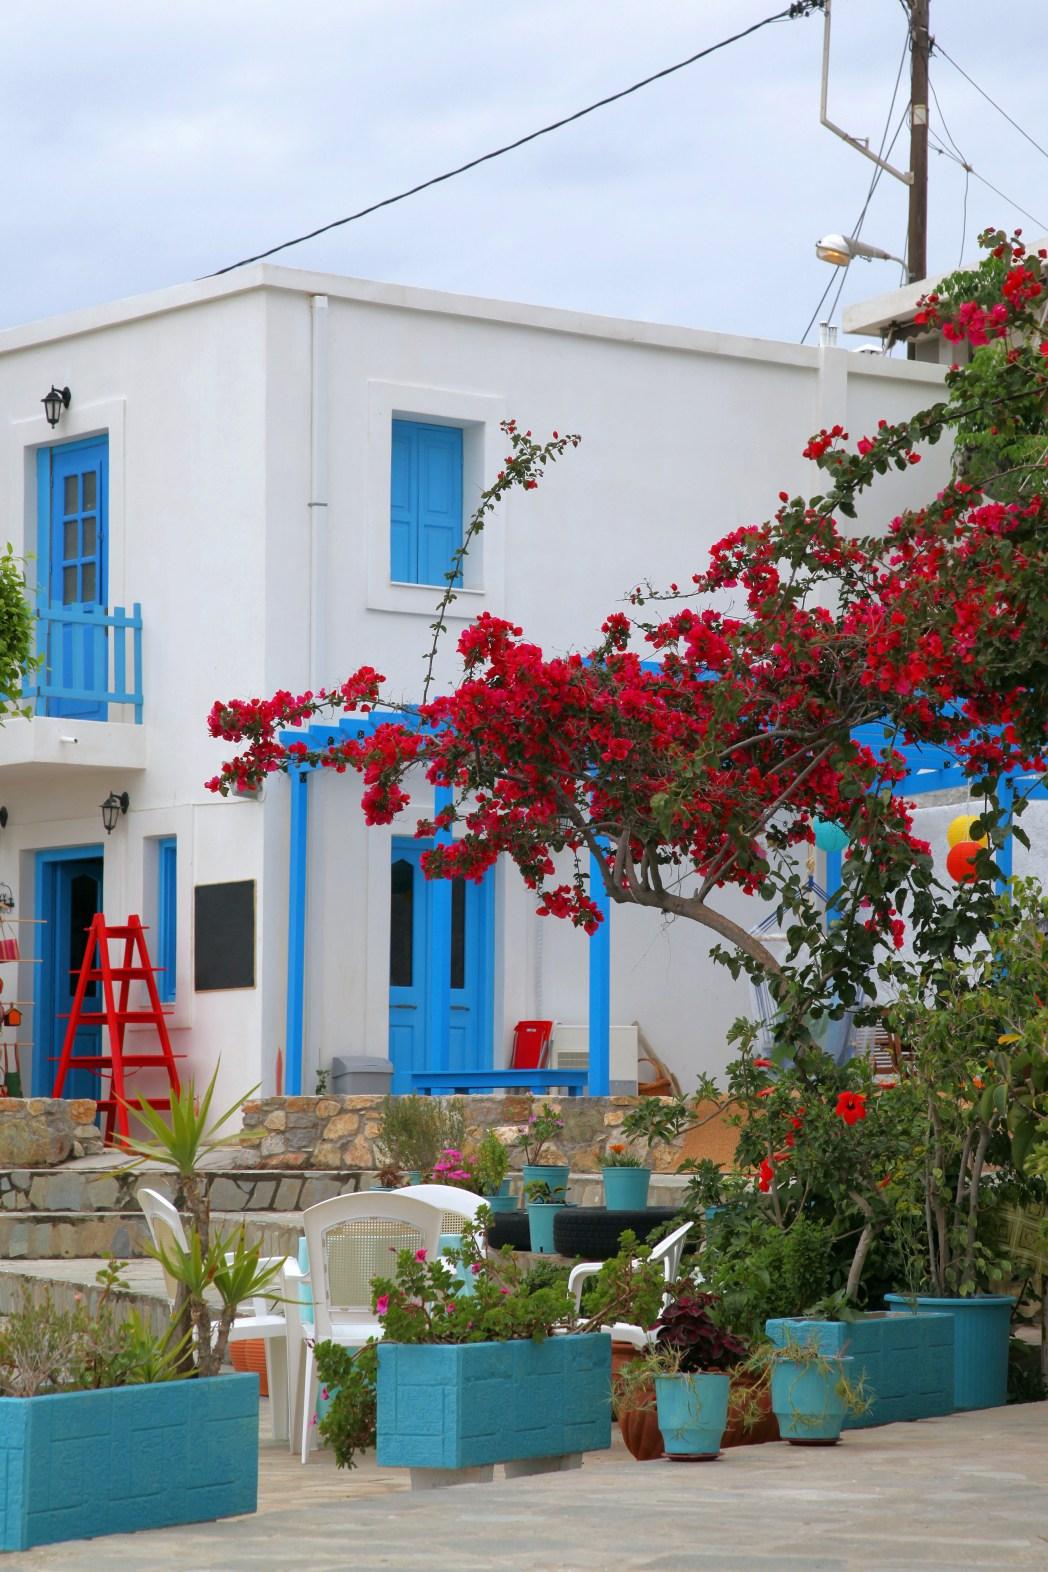 Geheimtipp Griechenland: Schöne Inseln